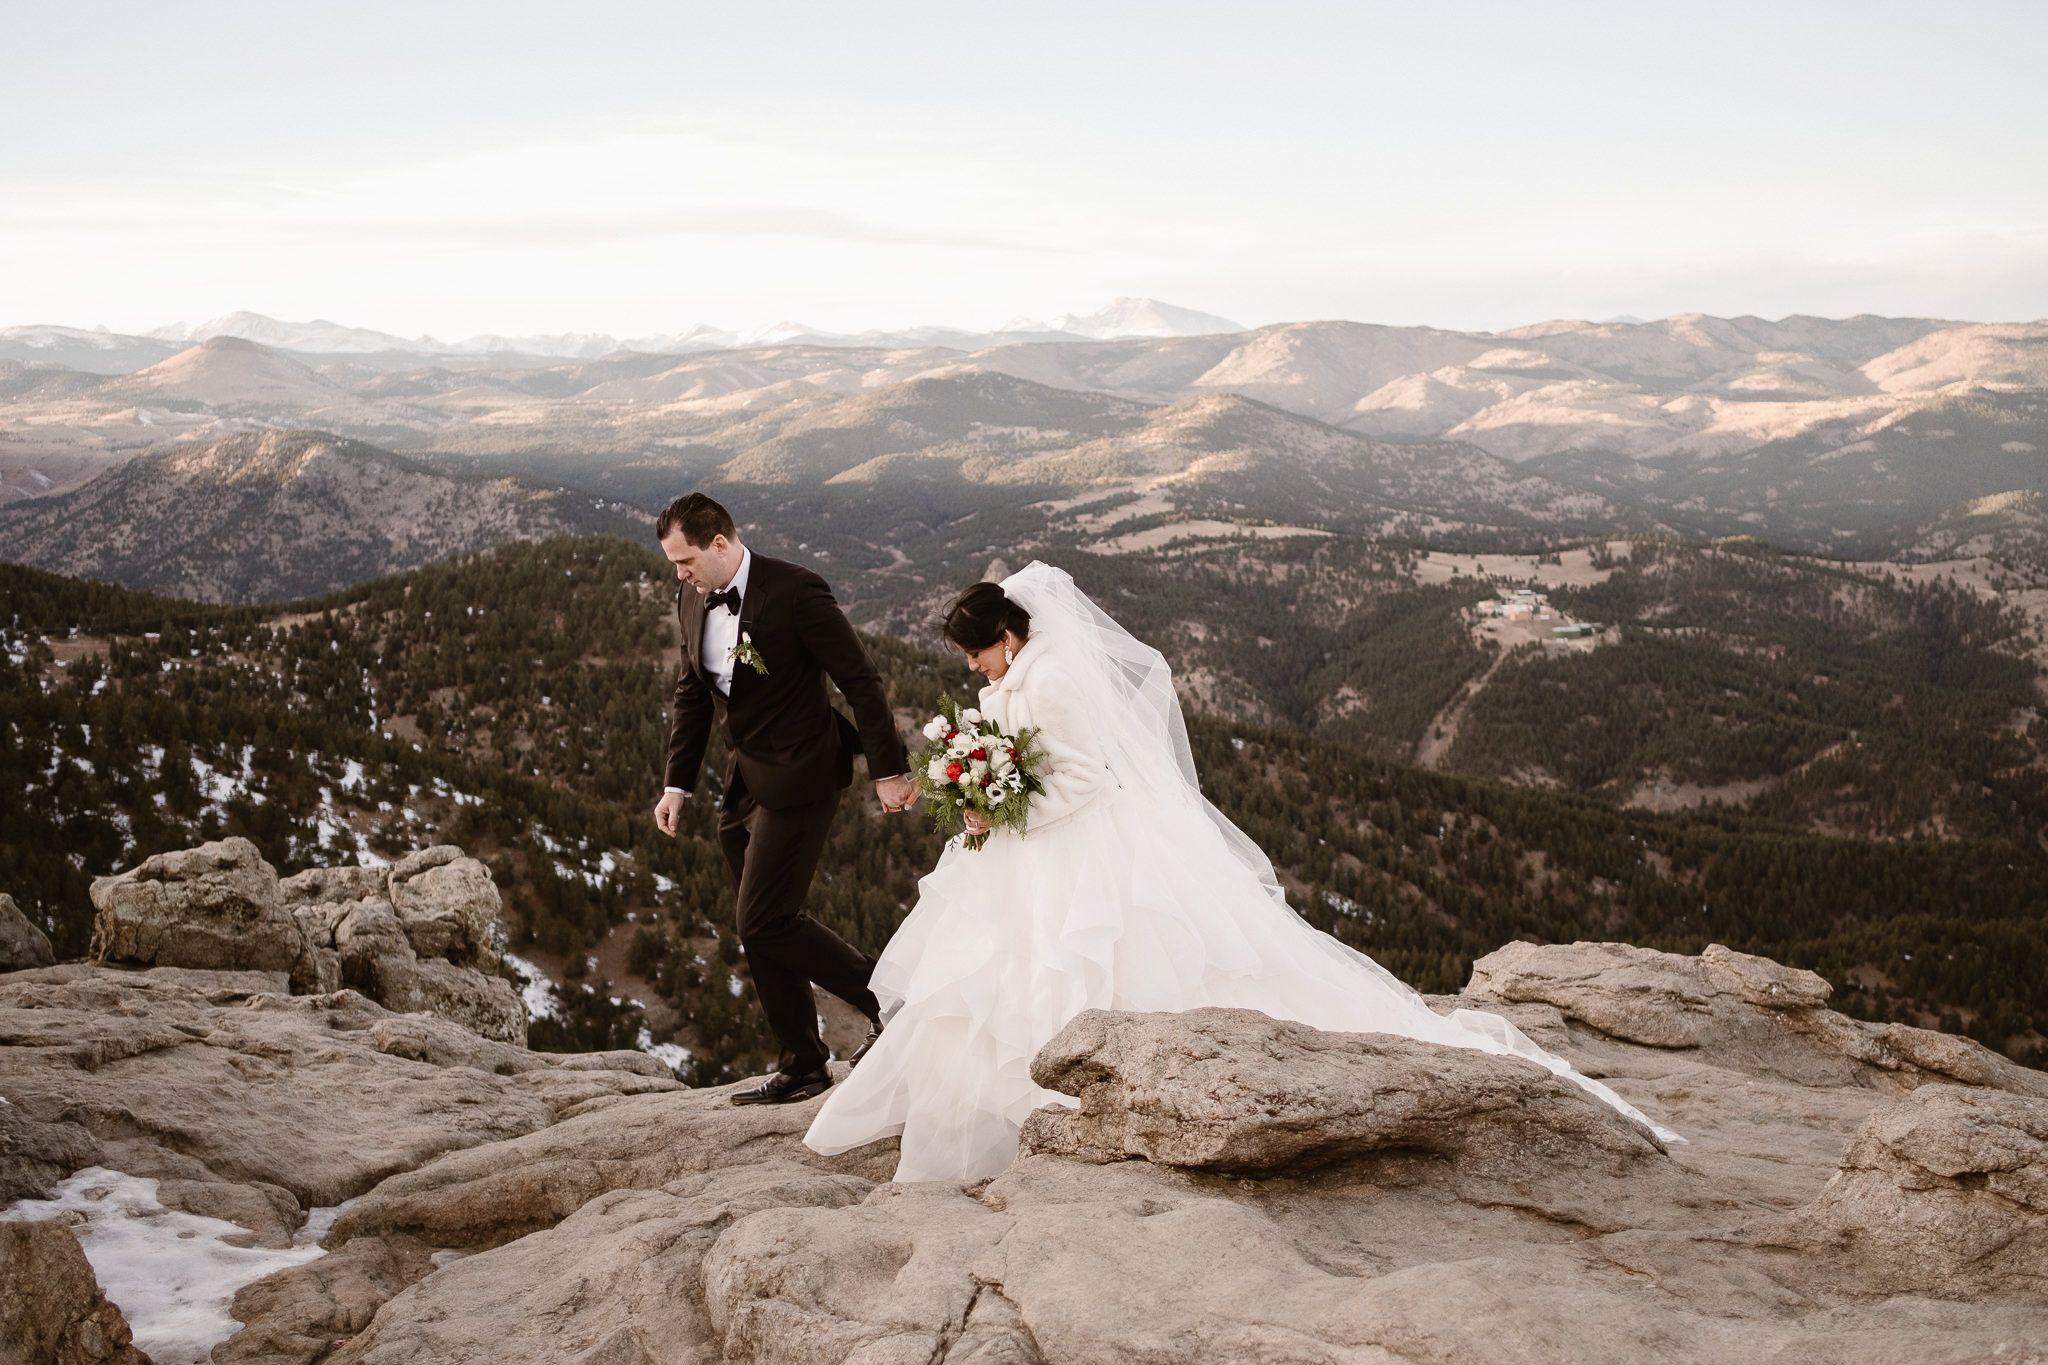 St Julien Wedding Ceremony And Flagstaff House Reception In Boulder Colorado Wedding Photographer Colorado Winter Wedding Museum Wedding Venues